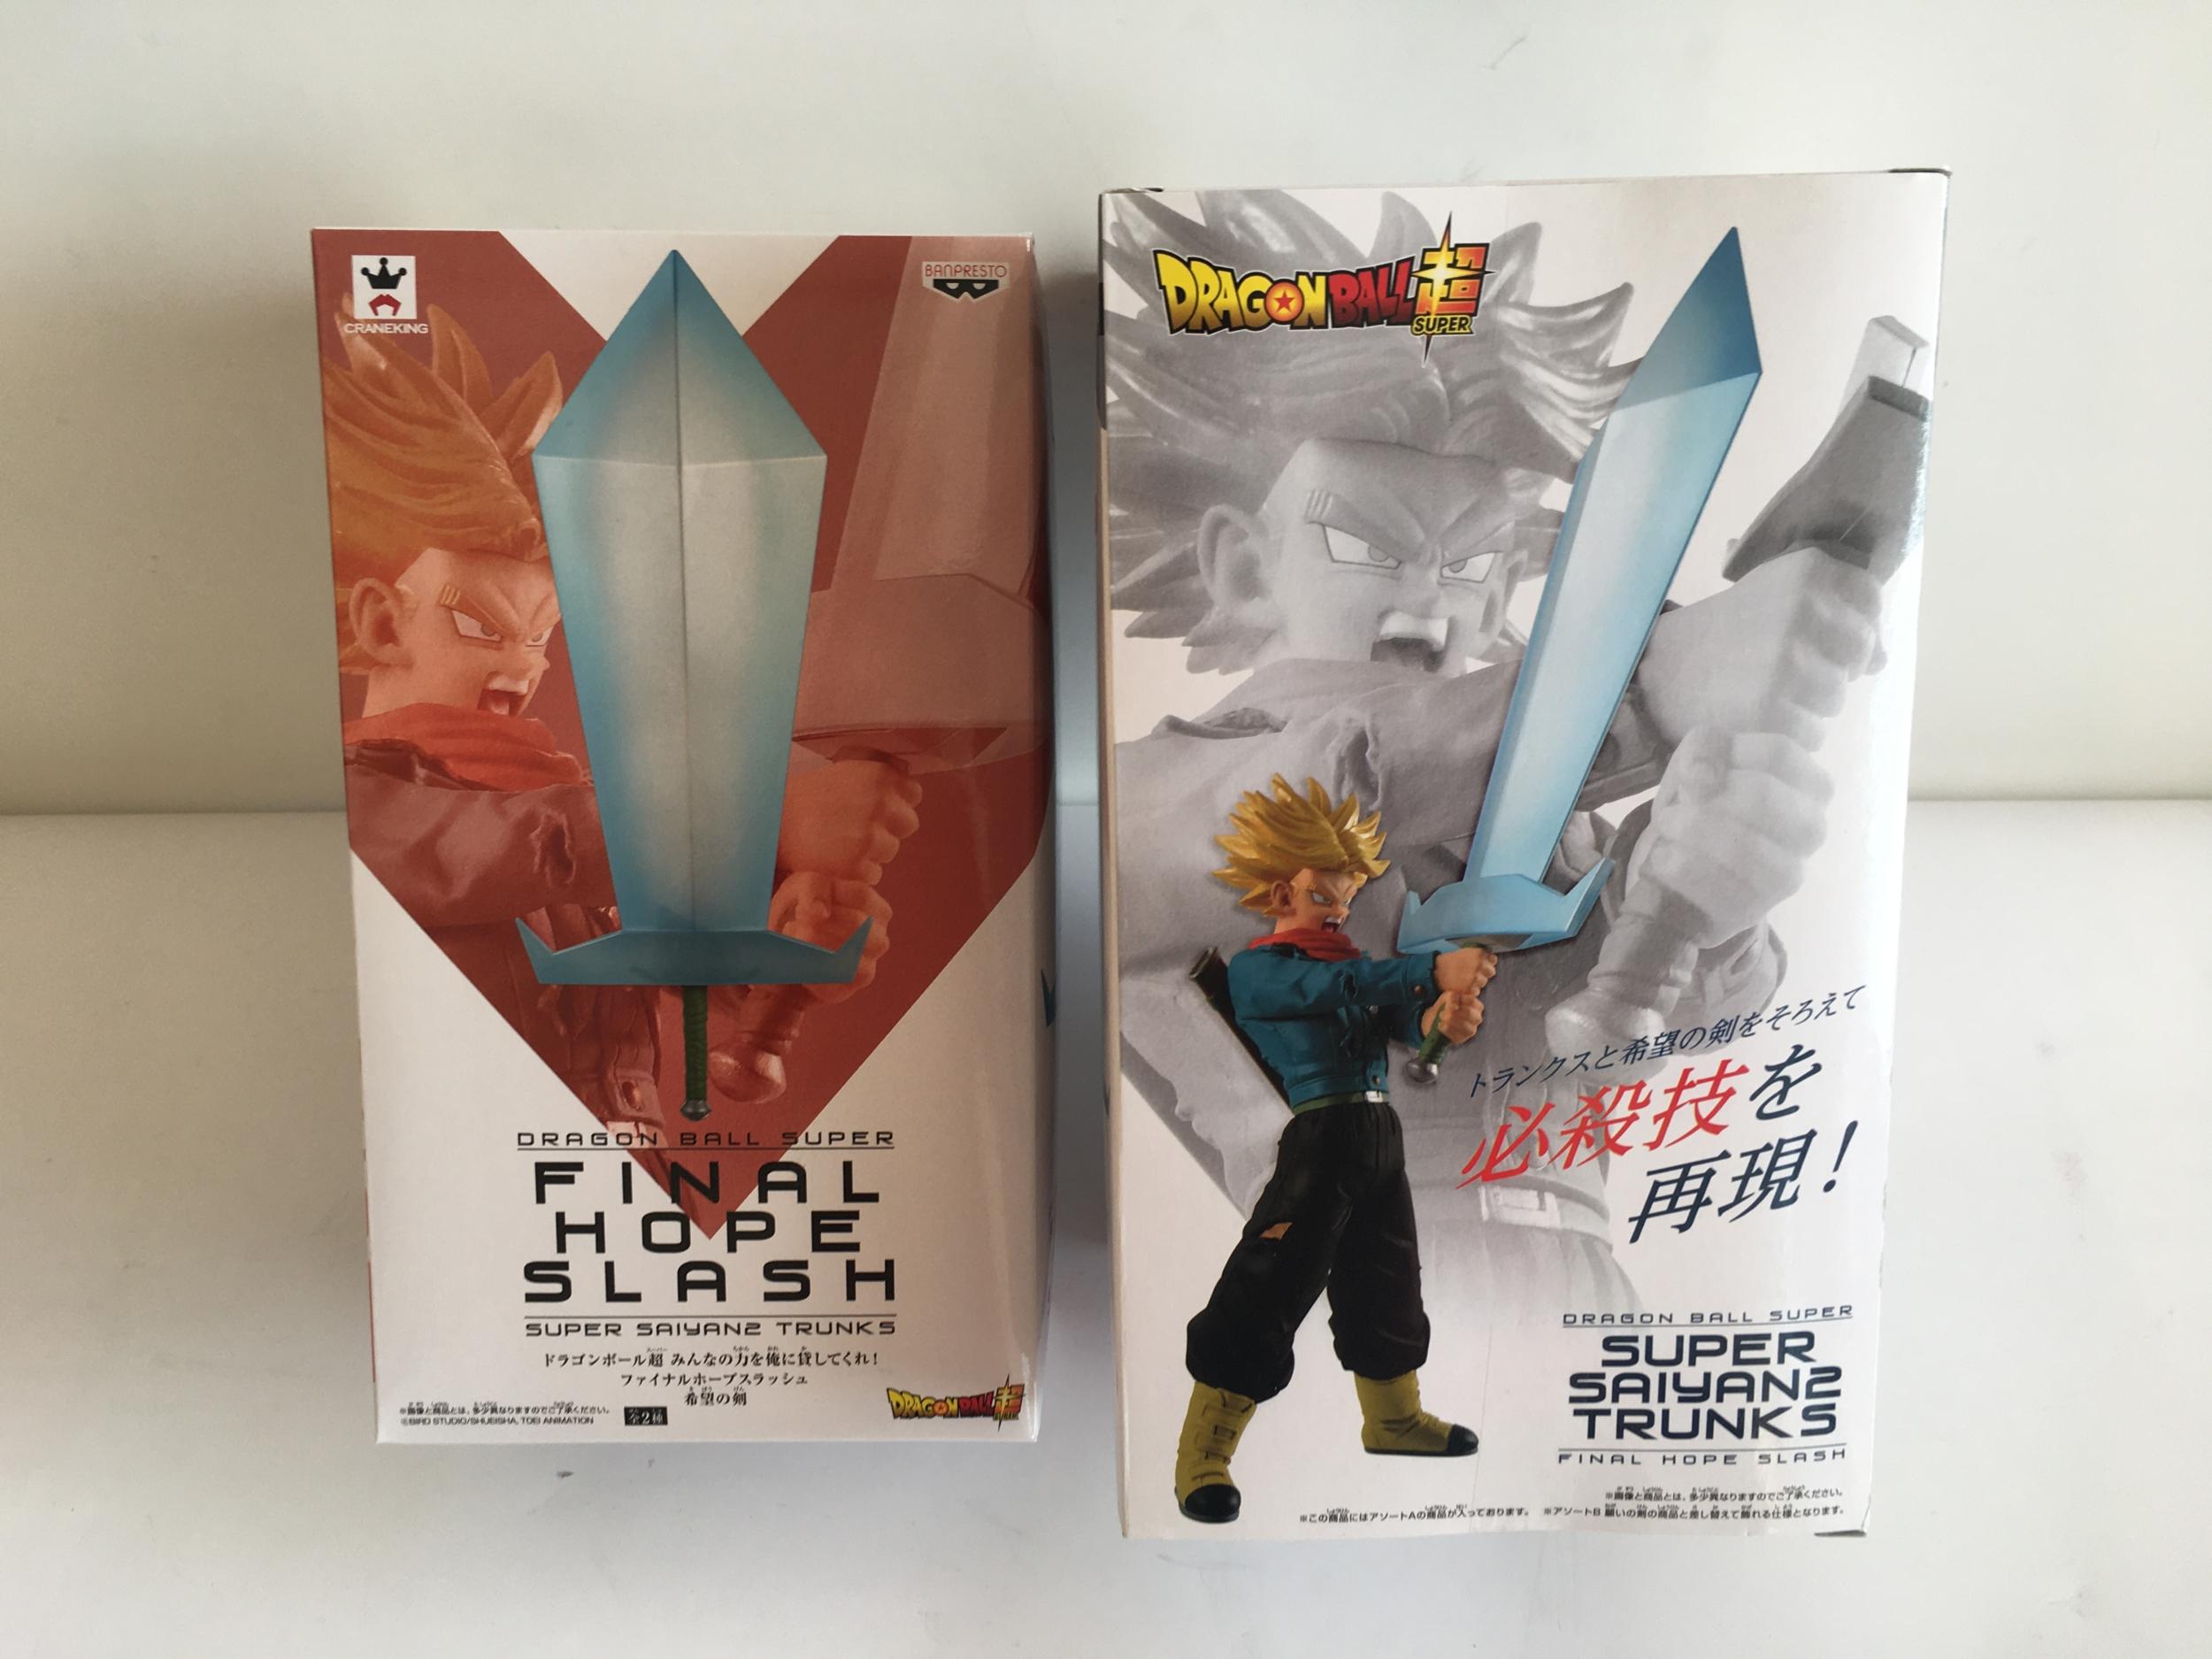 Super Saiyan 2 Trunks & Blade Of Hope   Figurine en PVC - Taille env. 24 cm avec socles  Sous licence officielle Dragon Ball